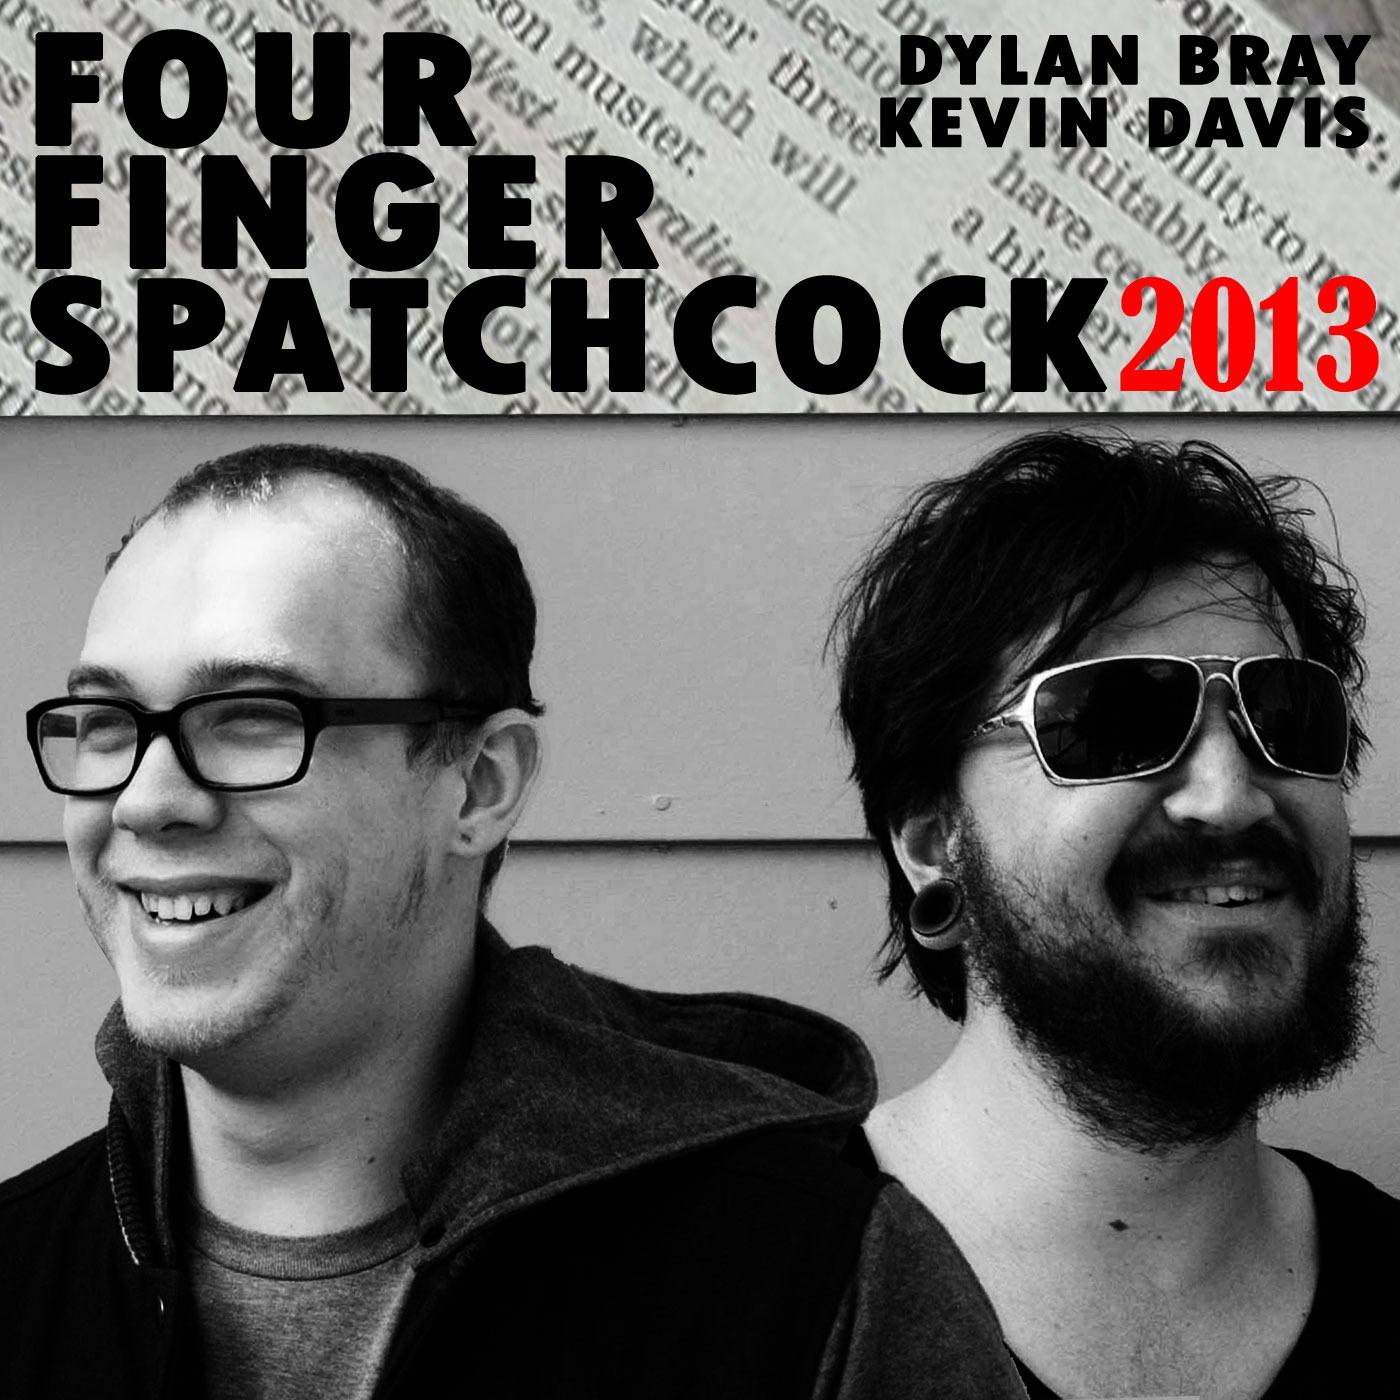 Four Finger Spatchcock 2013 Wrap Up